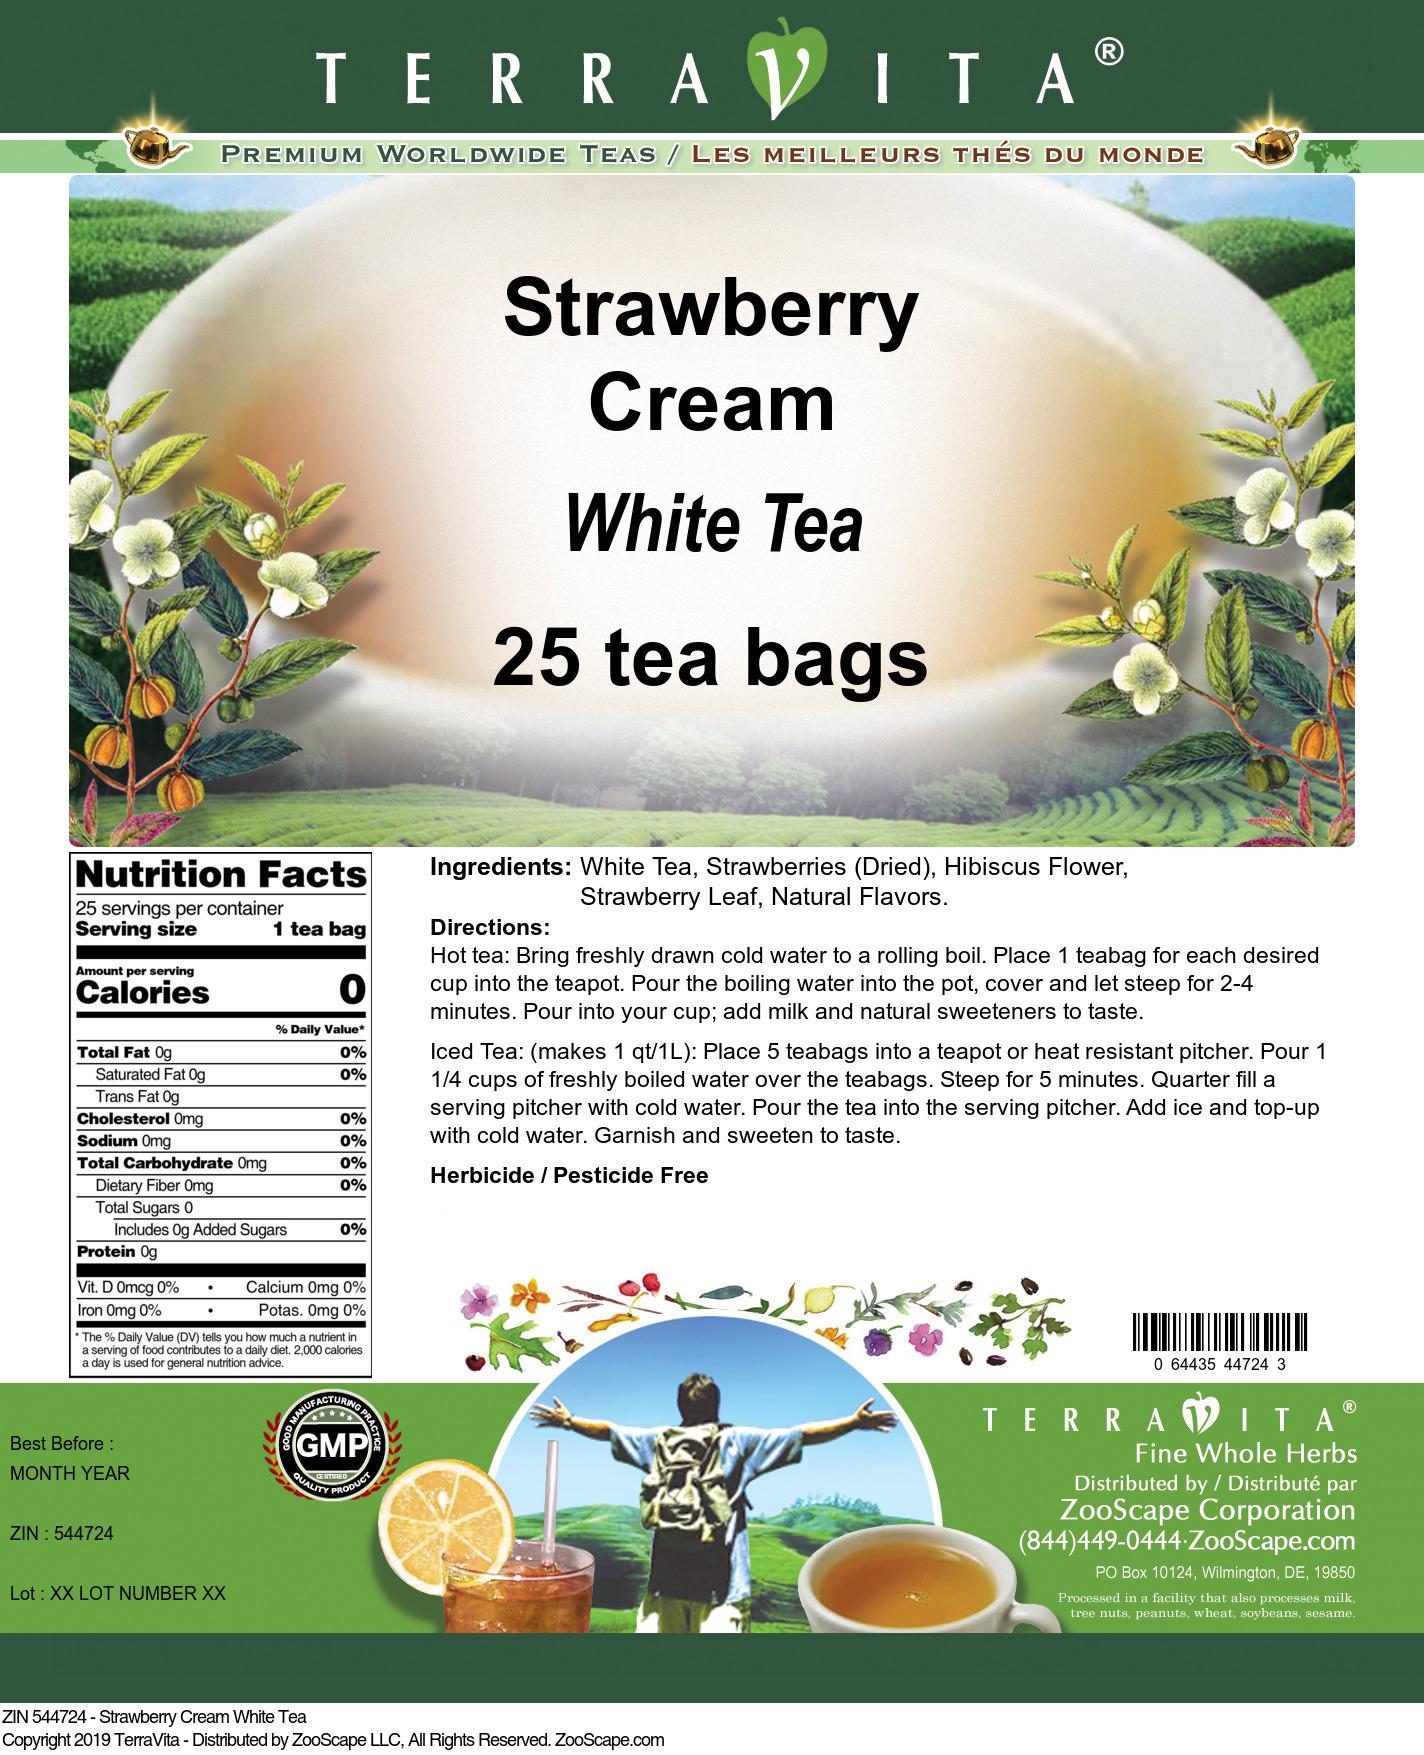 Strawberry Cream White Tea